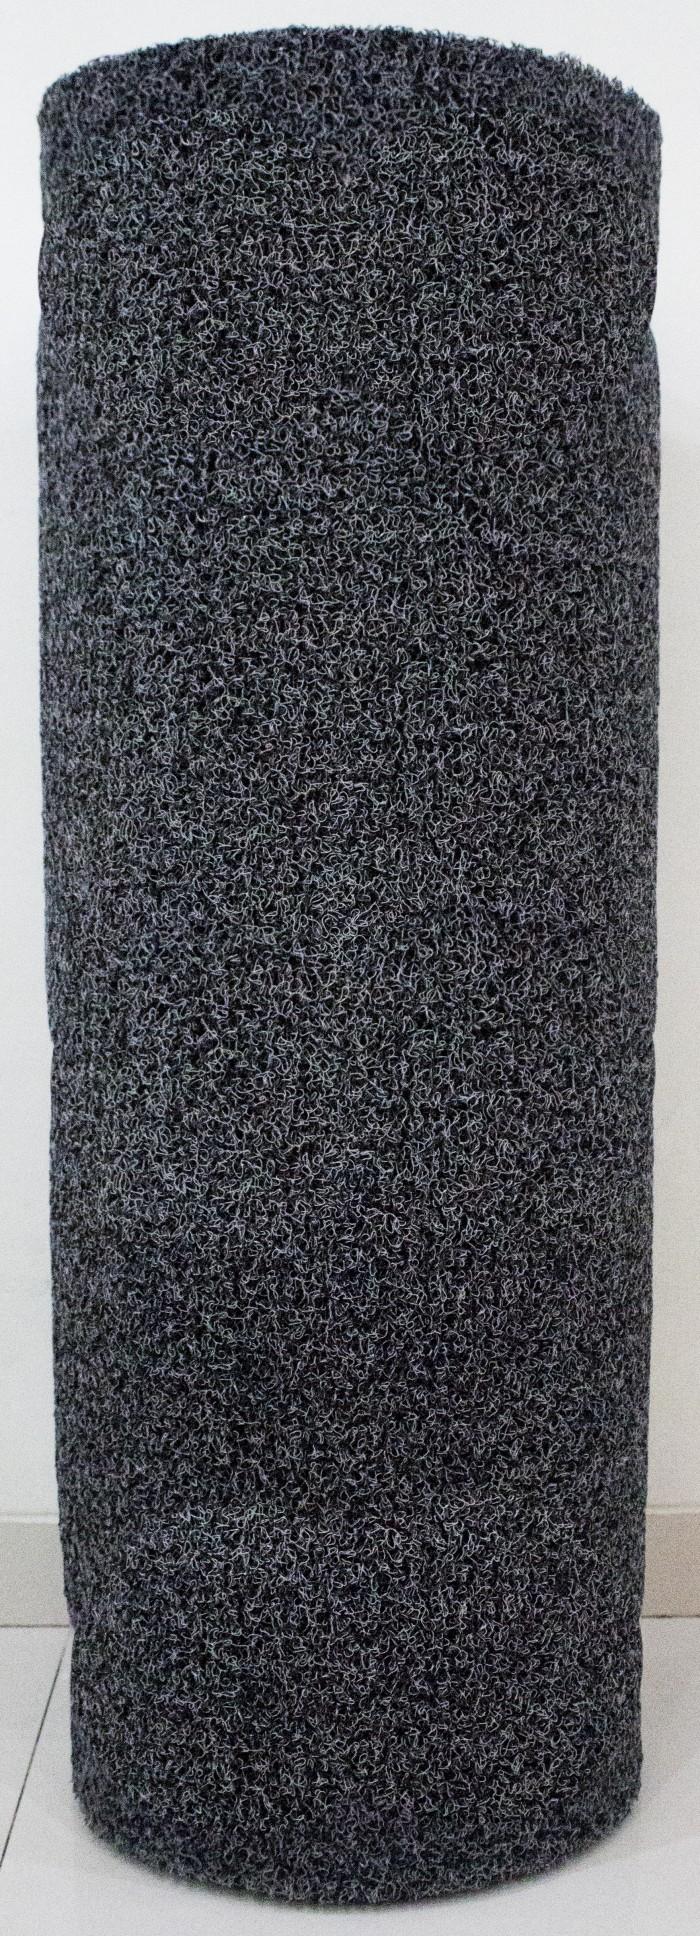 harga Keset mie coil floor door mat karpet bangunan deluxe roll Tokopedia.com